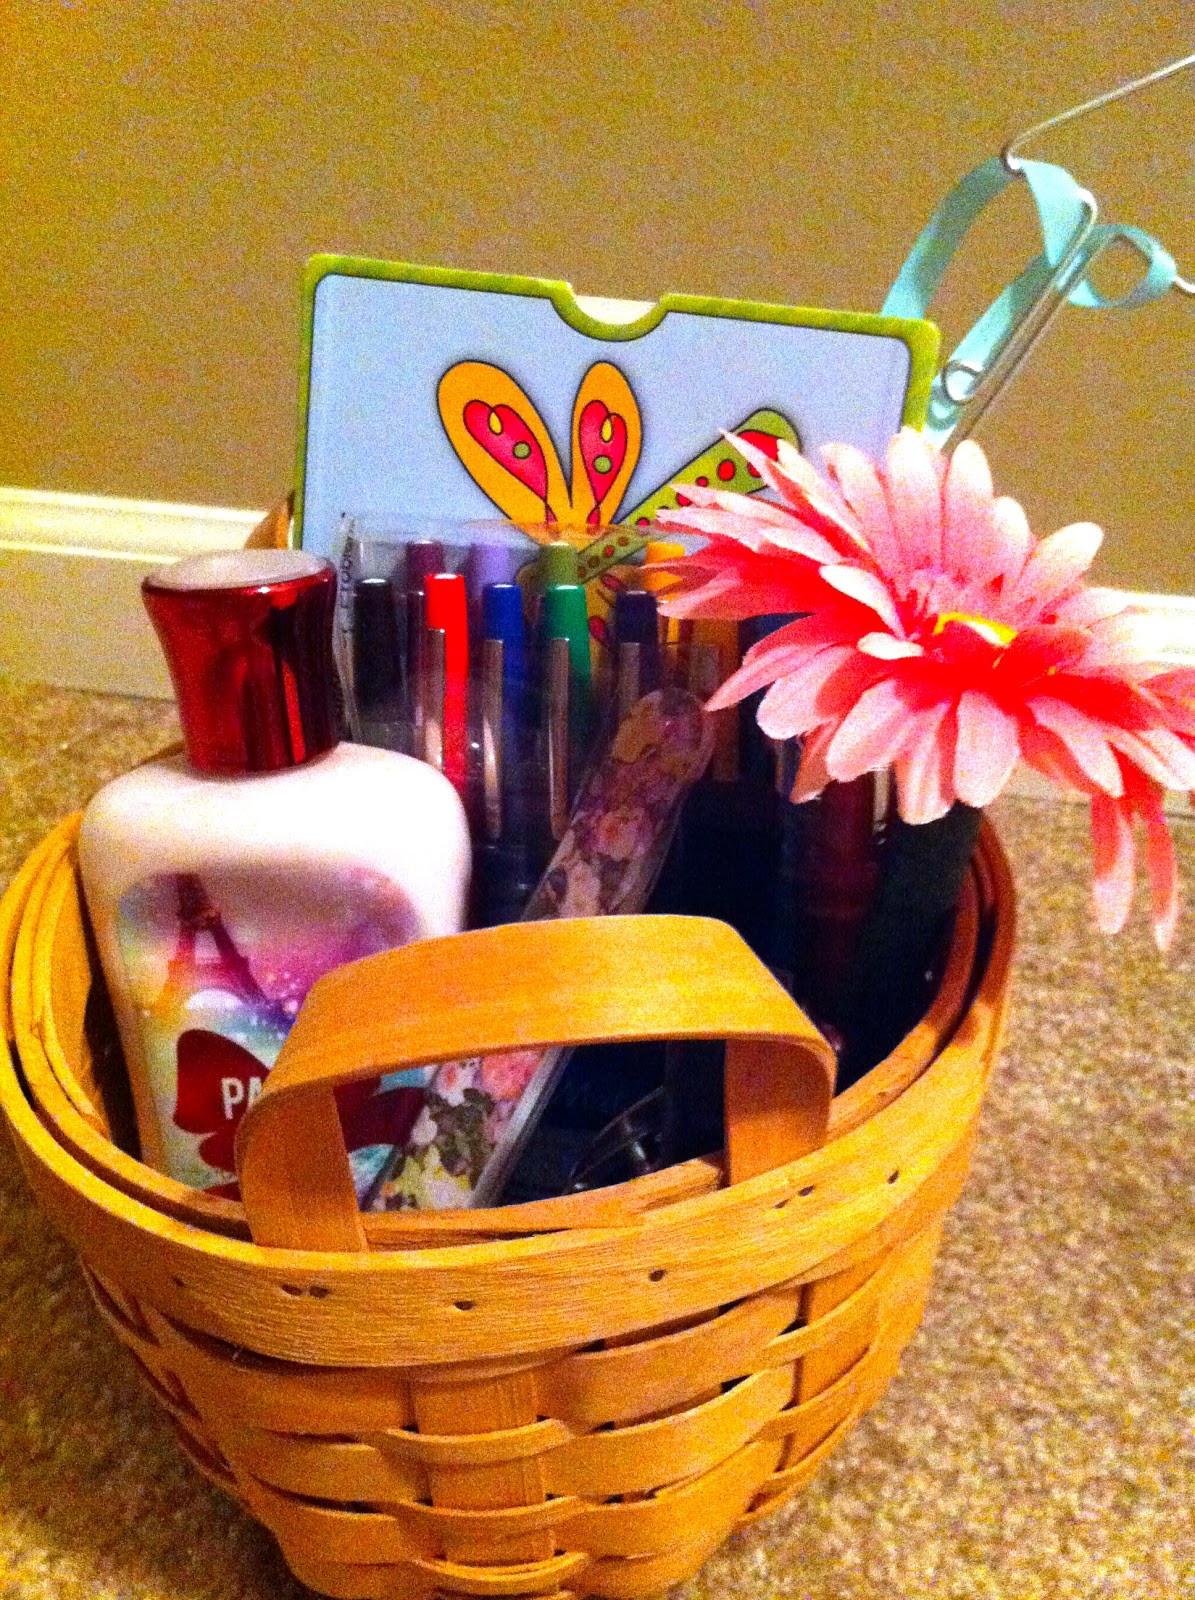 Best ideas about Student Teacher Gift Ideas . Save or Pin Cheers to School Student Teacher & Teacher Mentor Gift Ideas Now.